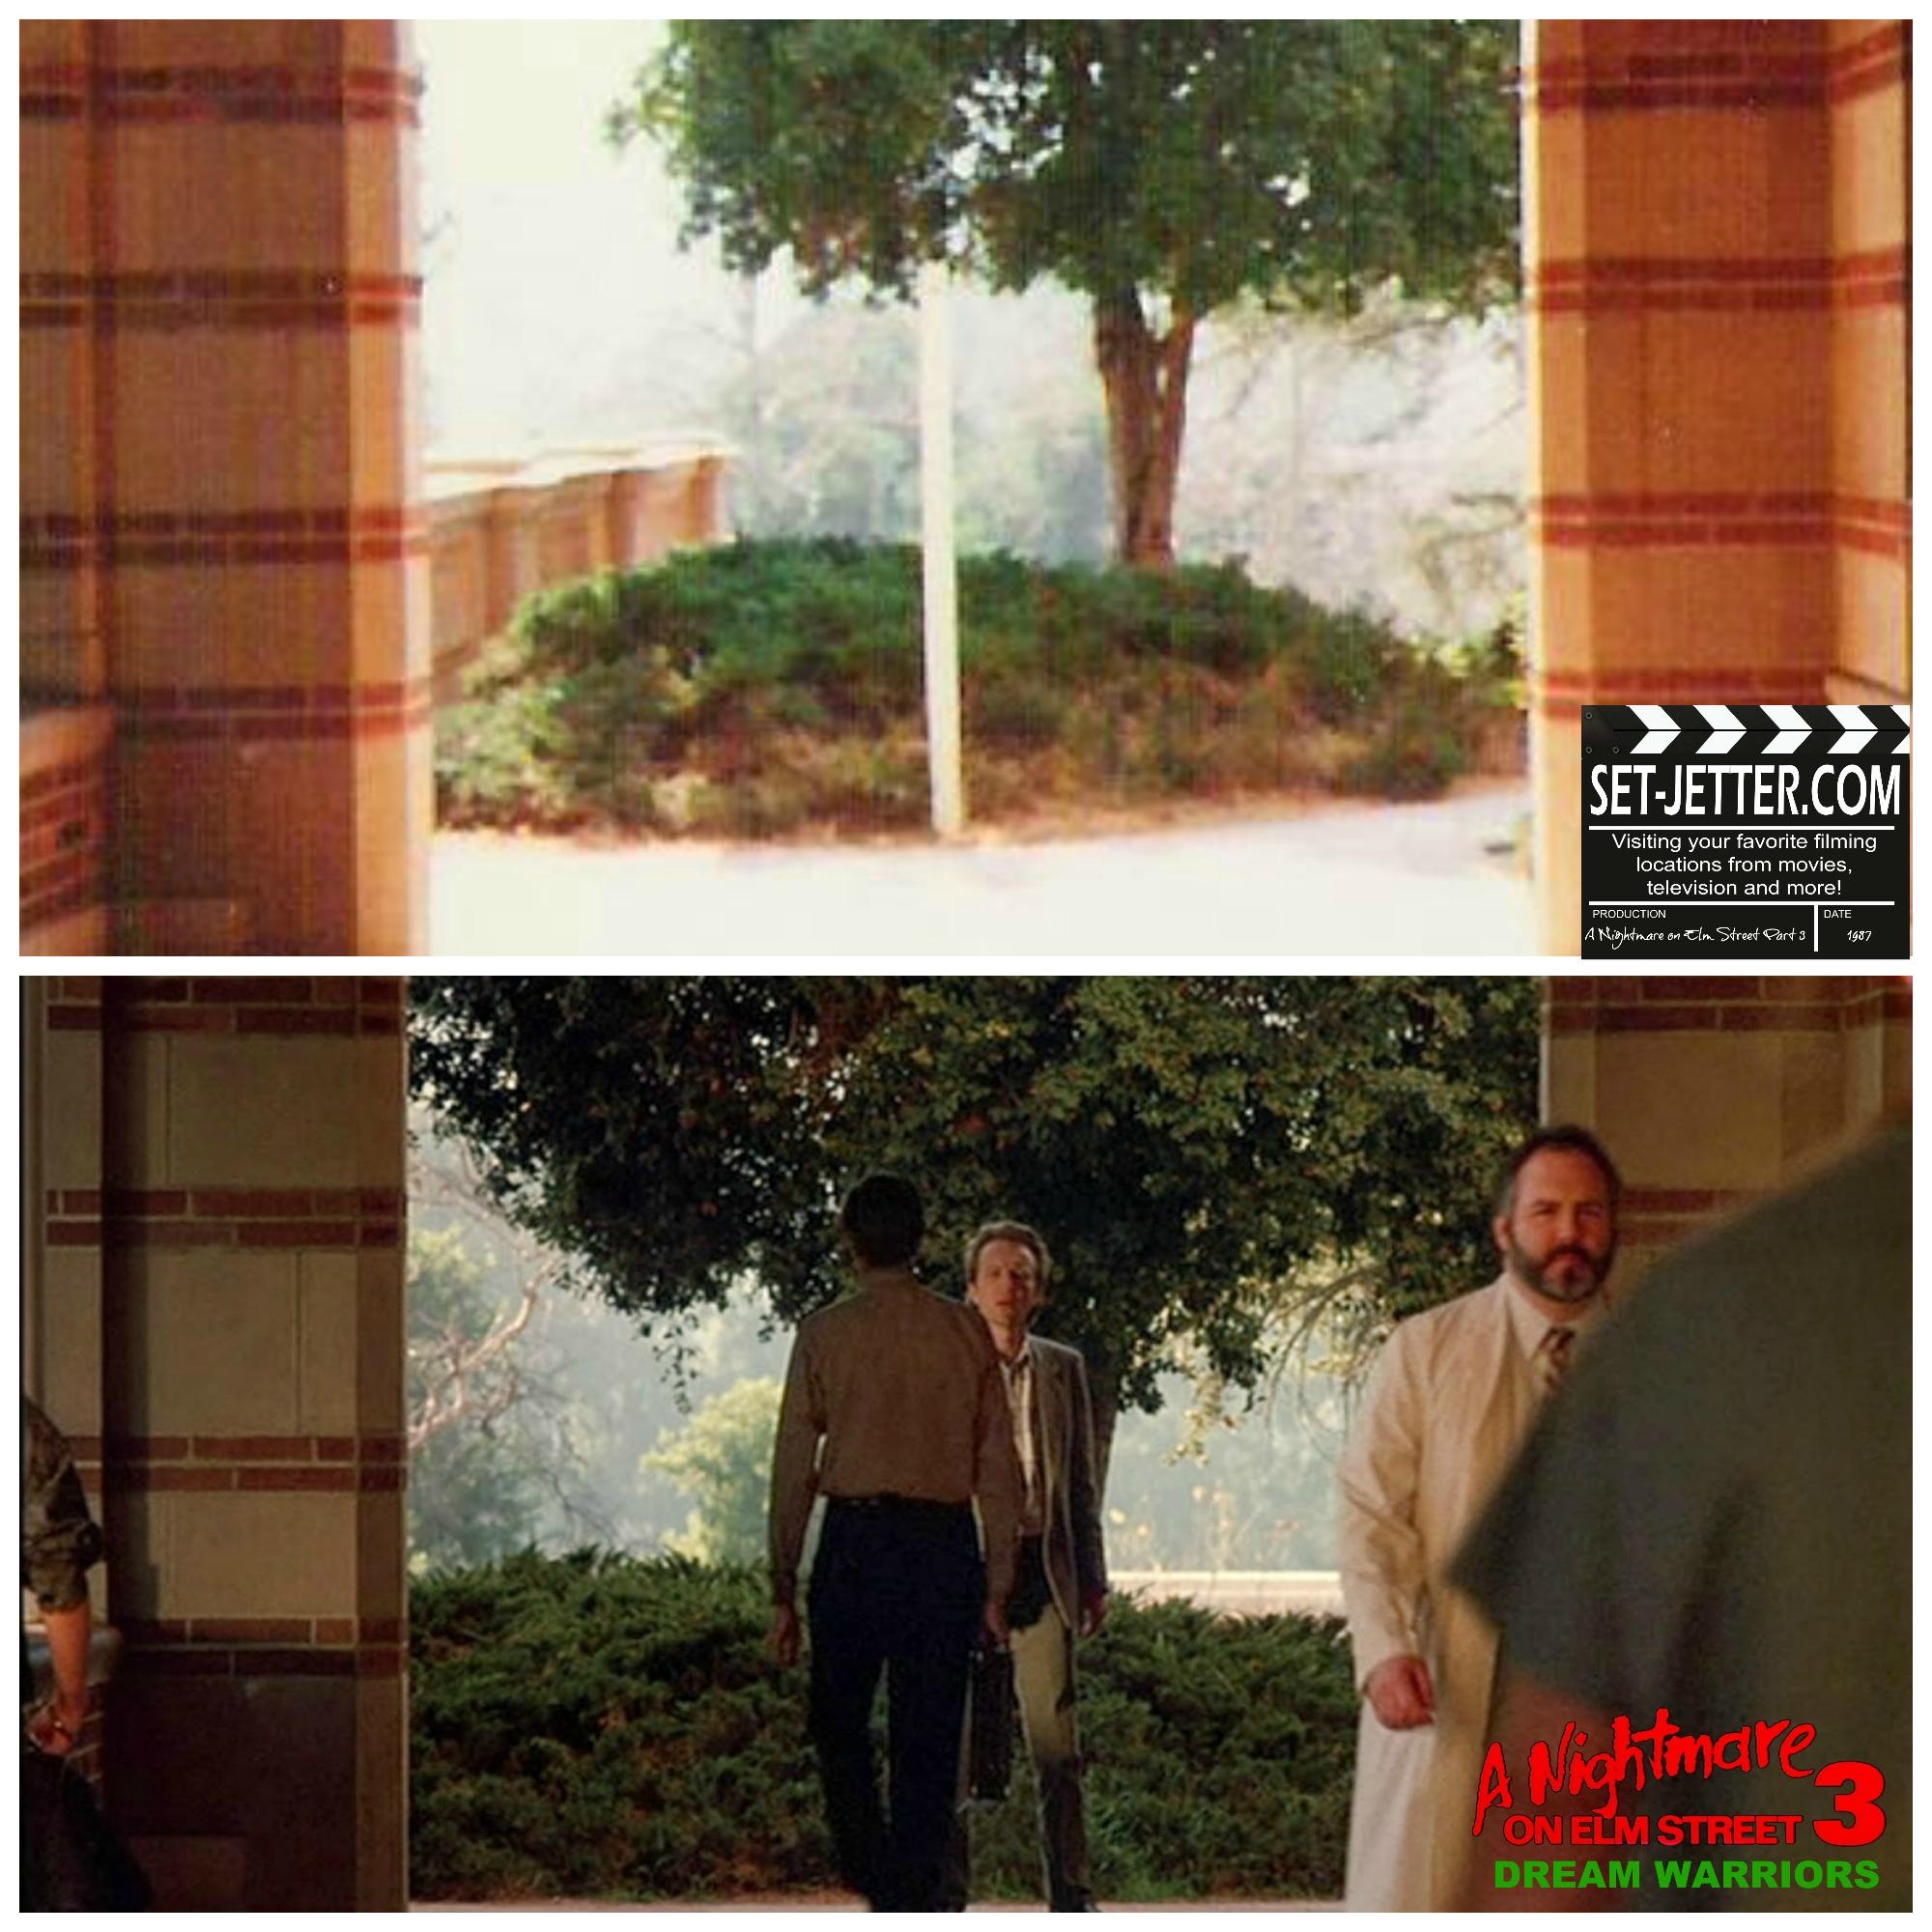 Nightmare on Elm Street Part 3 comparison 05.jpg